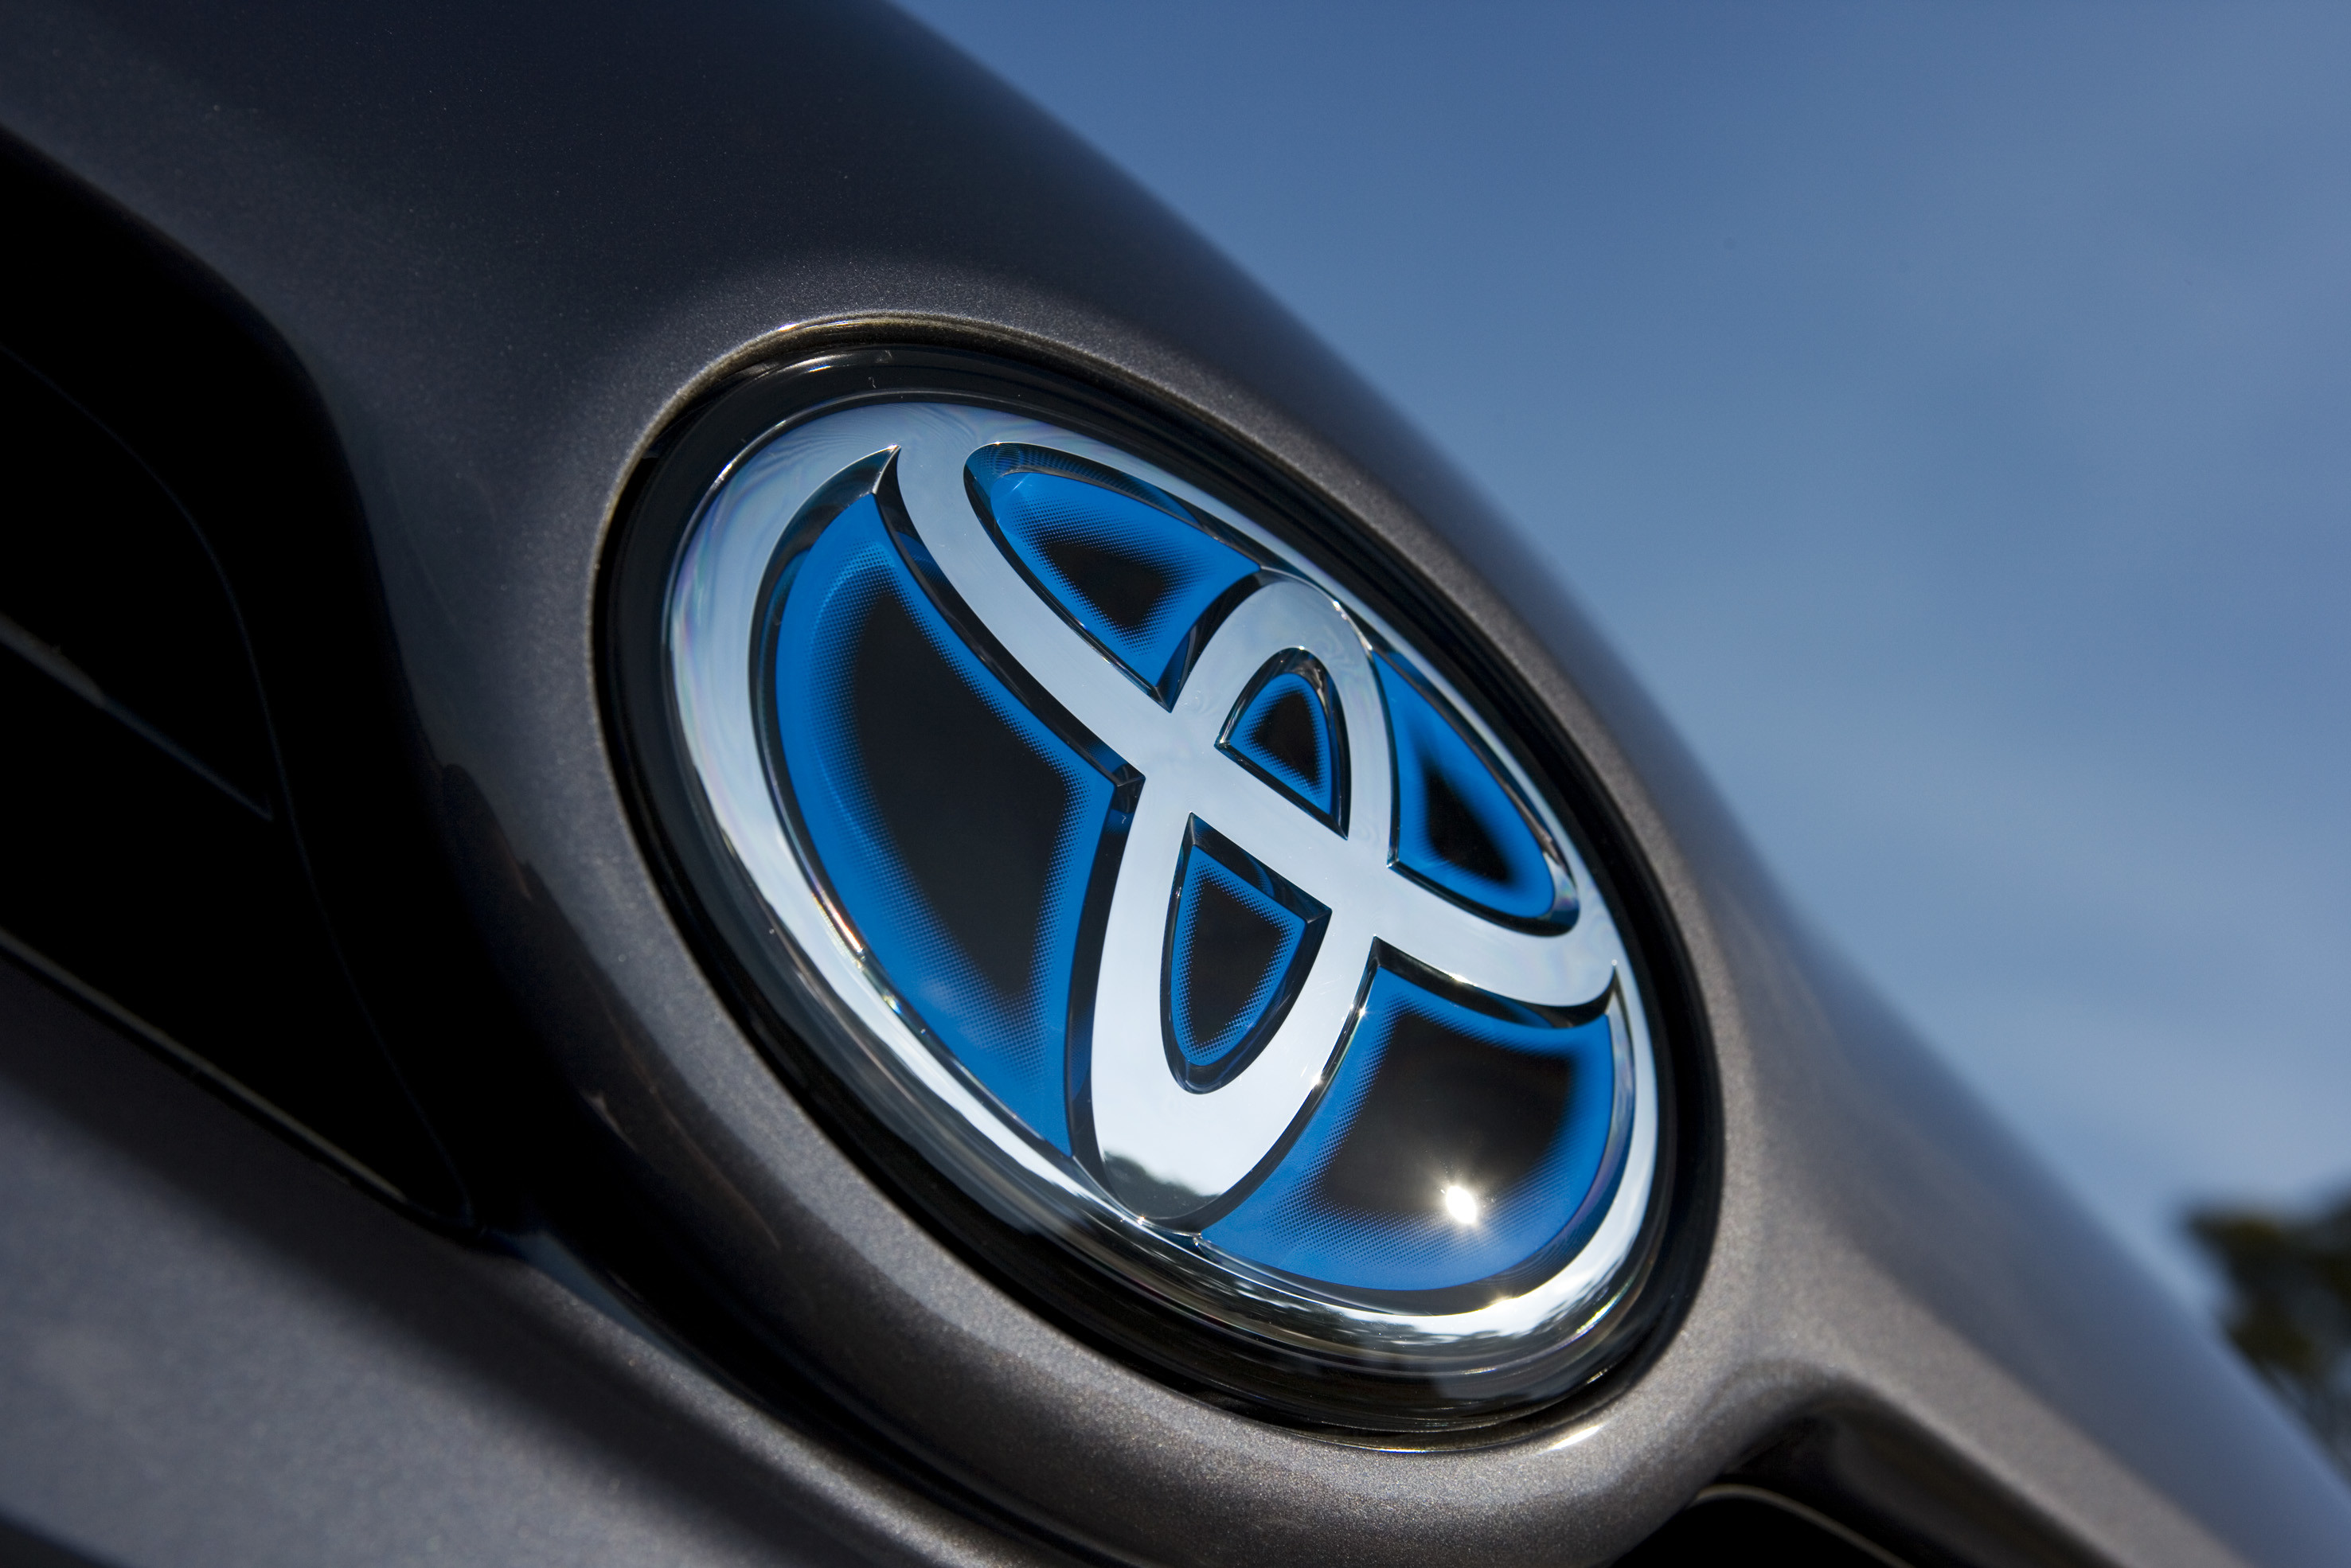 … Toyota Prius Hybrid Synergy Drive, …